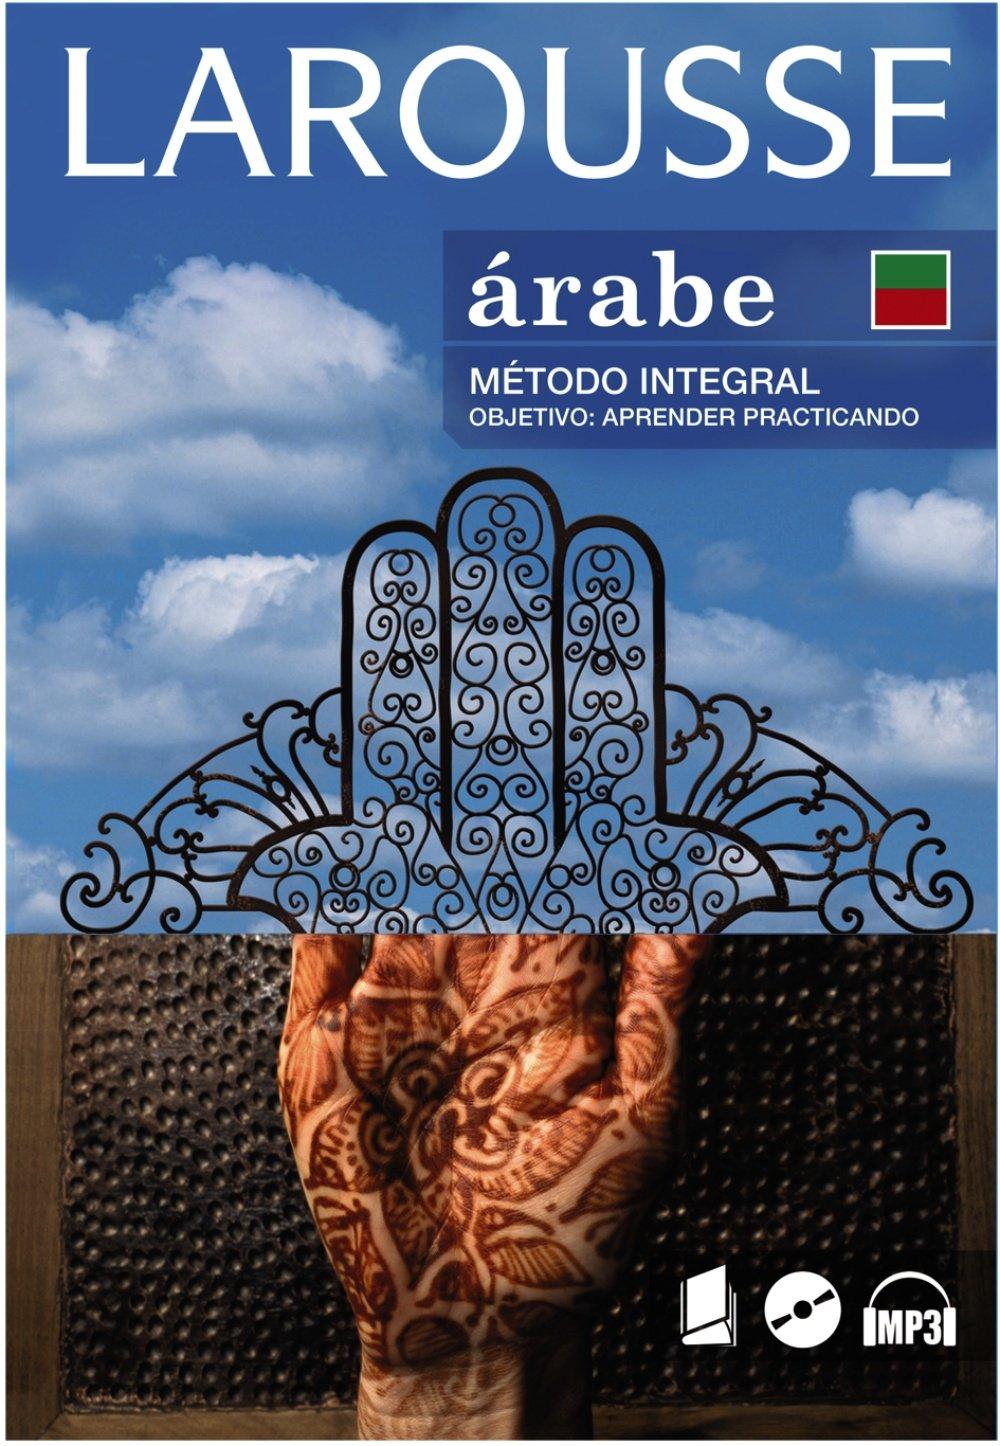 Árabe. Método integral (Larousse - Métodos Integrales) Tapa blanda – 1 jun 2009 Aa.Vv. 8480165774 Spanish: Adult Nonfiction Language self-study texts